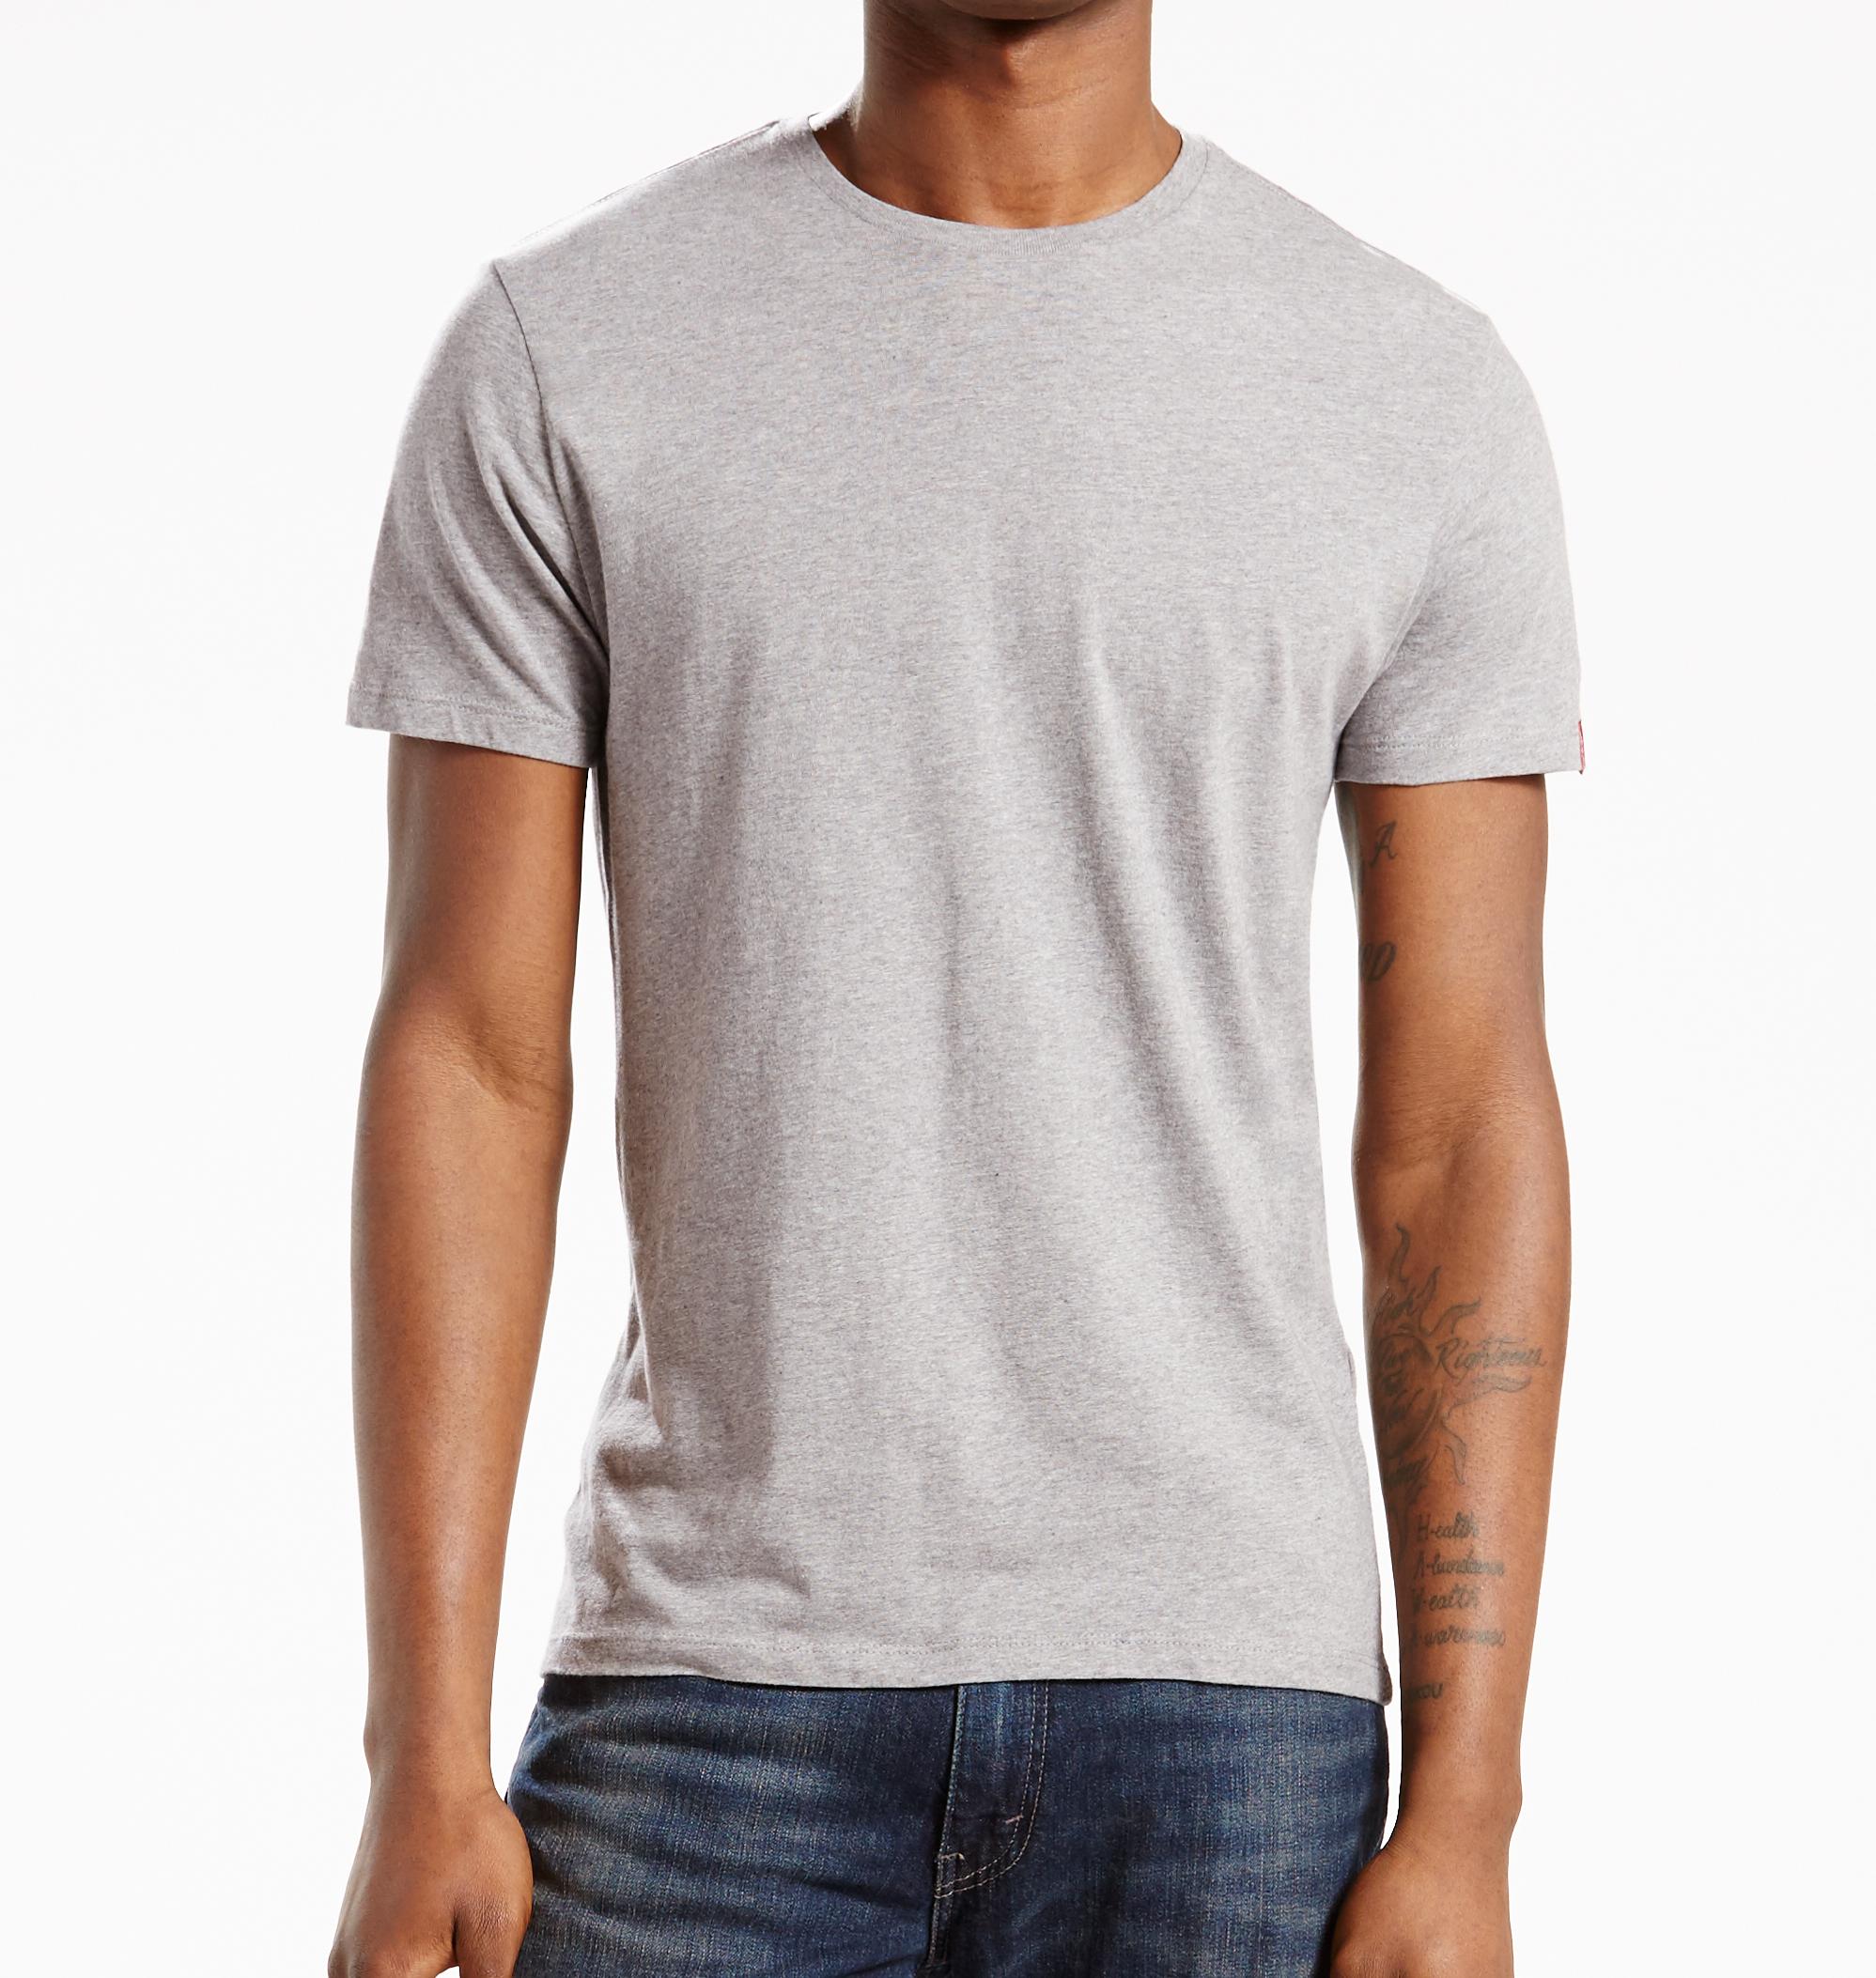 LEVIS 2er Pack Shirts Rundhals T-Shirt 82176-0005 grau W18-LVT1